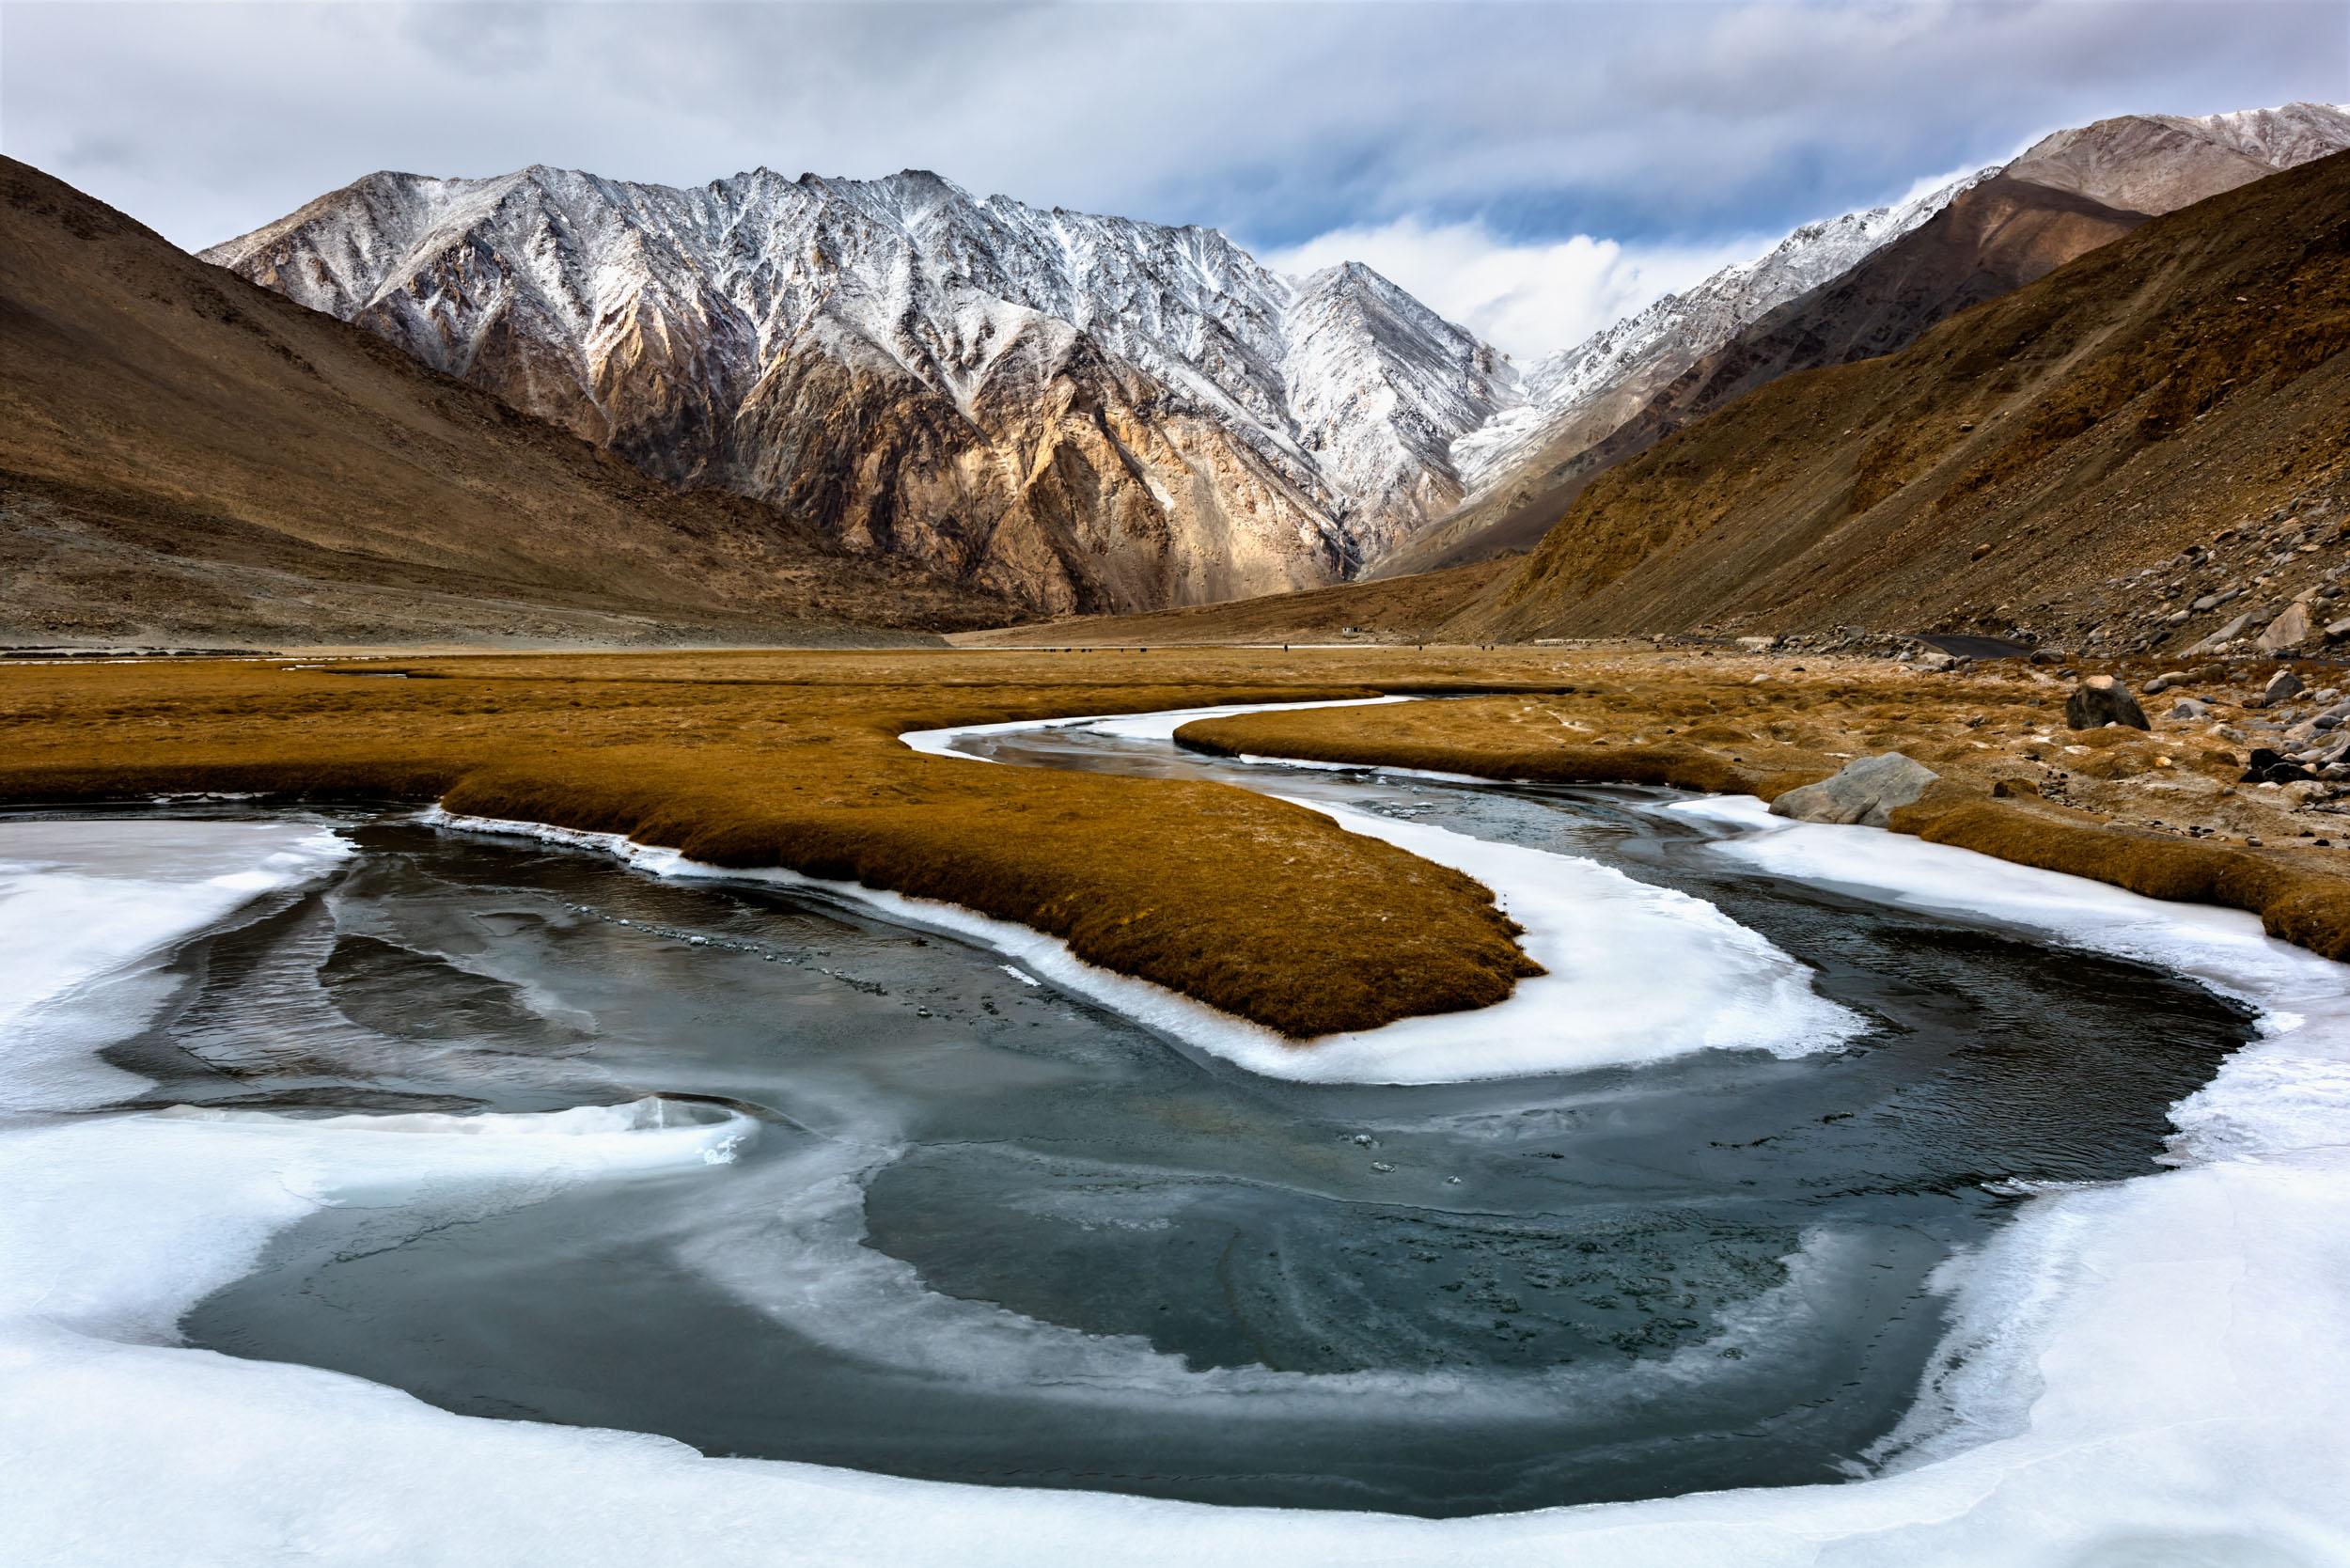 Frozen Streams in Hialayas,Leh, Jammu and Kashmir